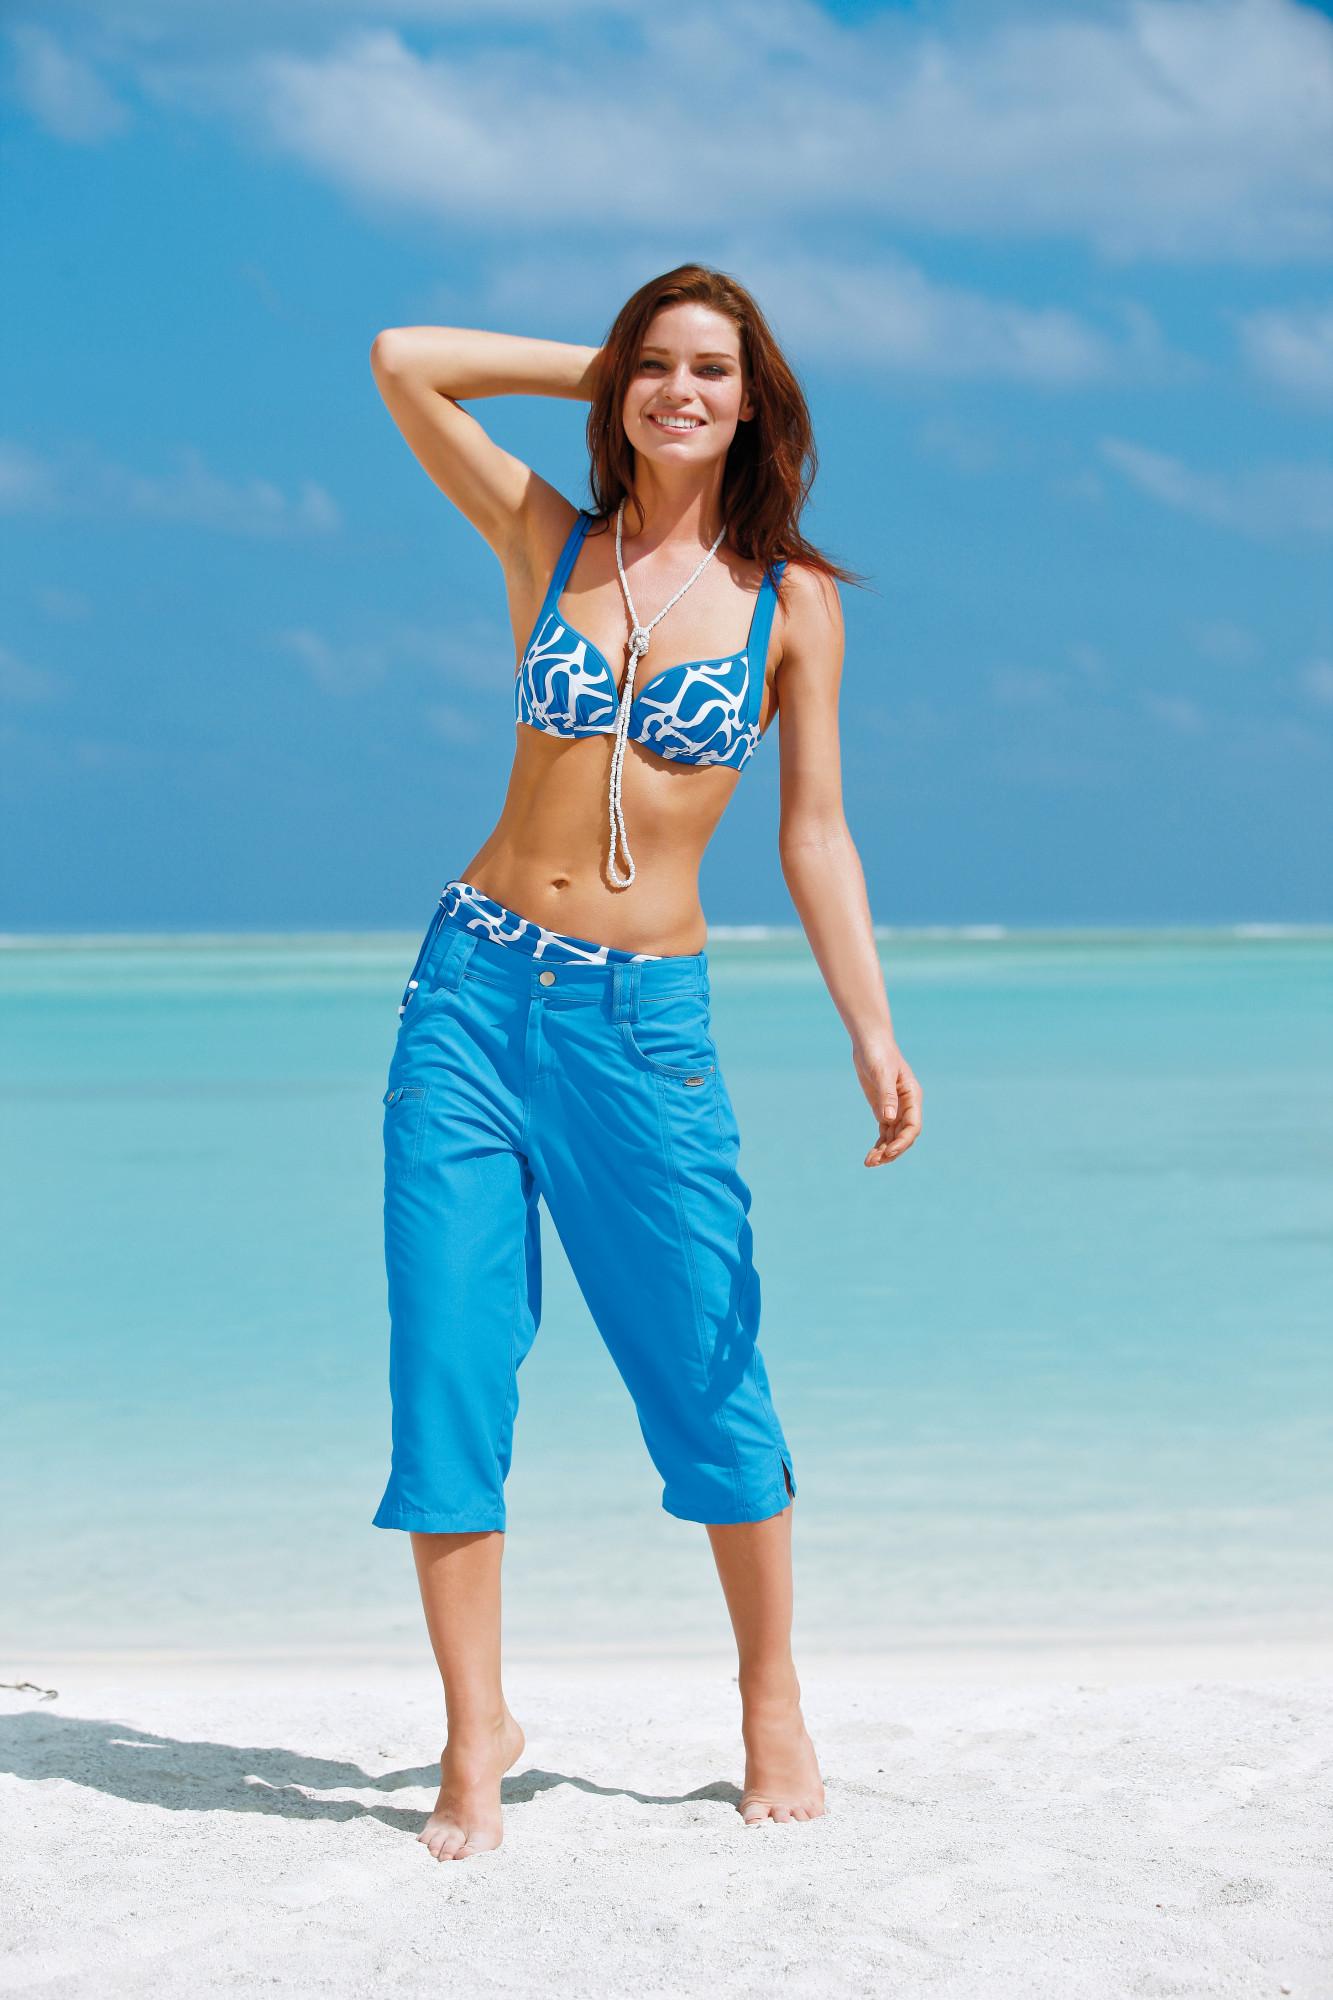 Dámské dvoudílné plavky 21214 - Sunflair Barva: modrá, Velikost: 42D